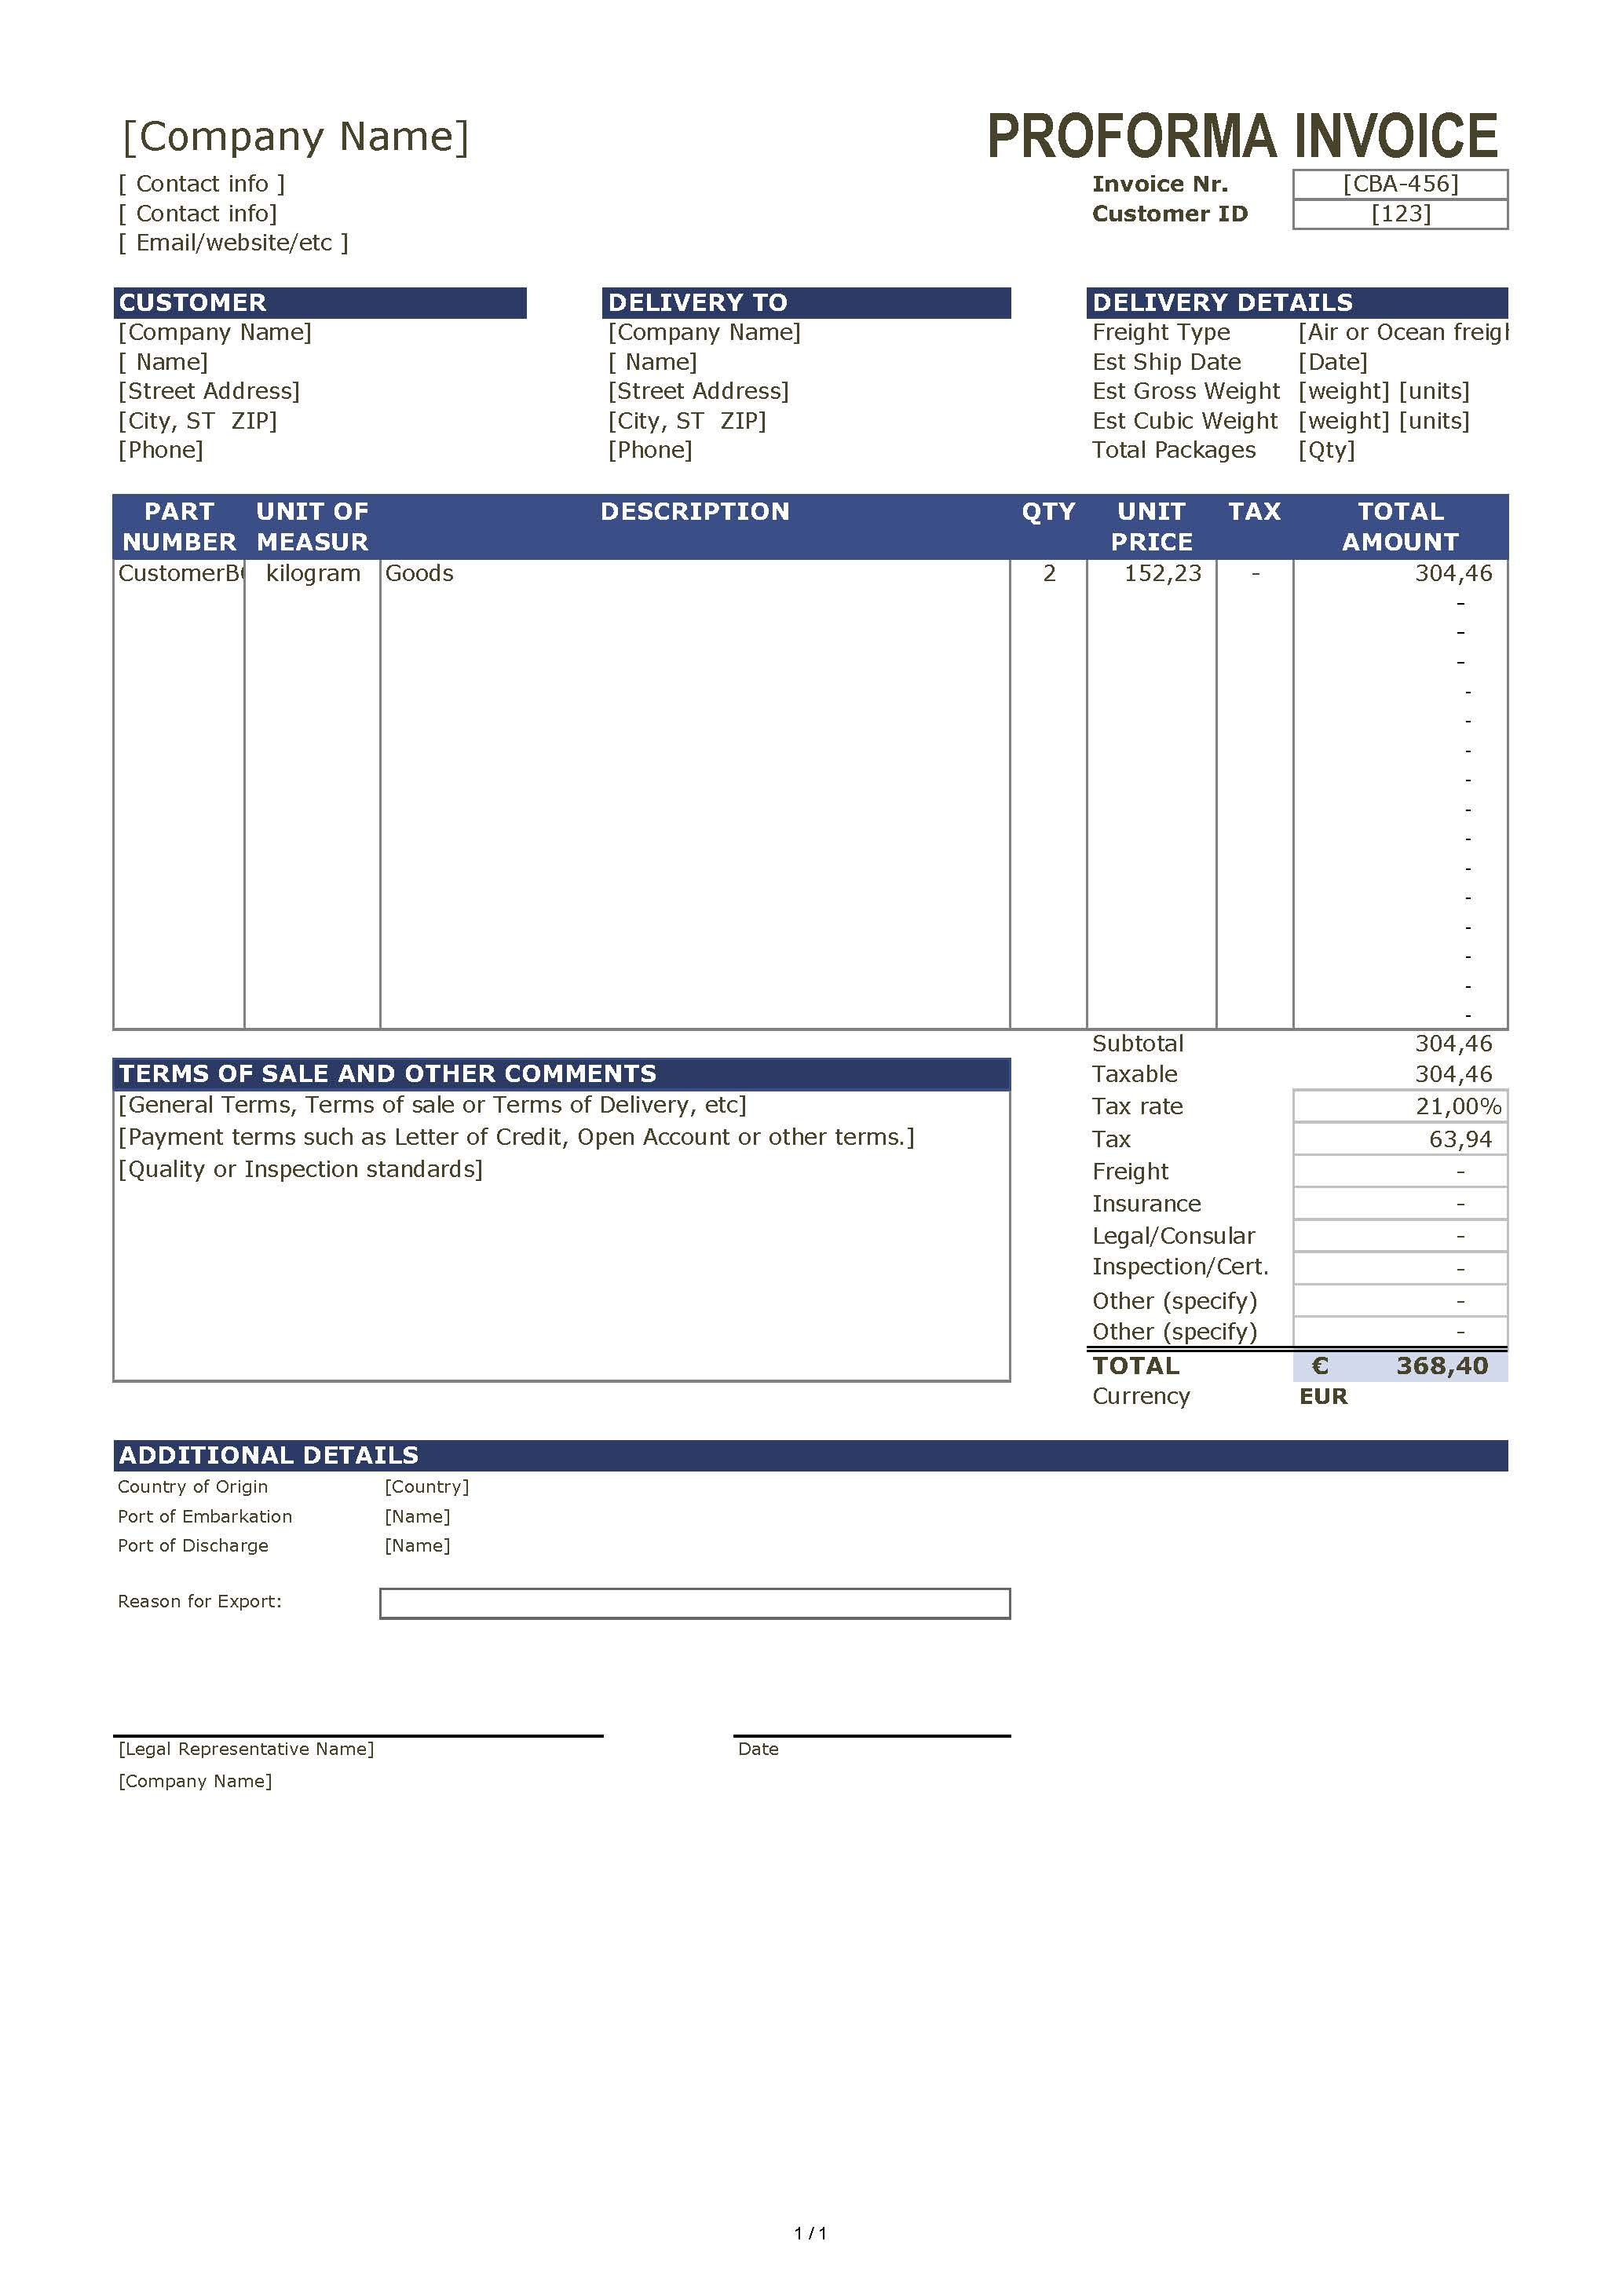 Proforma Invoice Template  Proforma Invoice Template  Templates